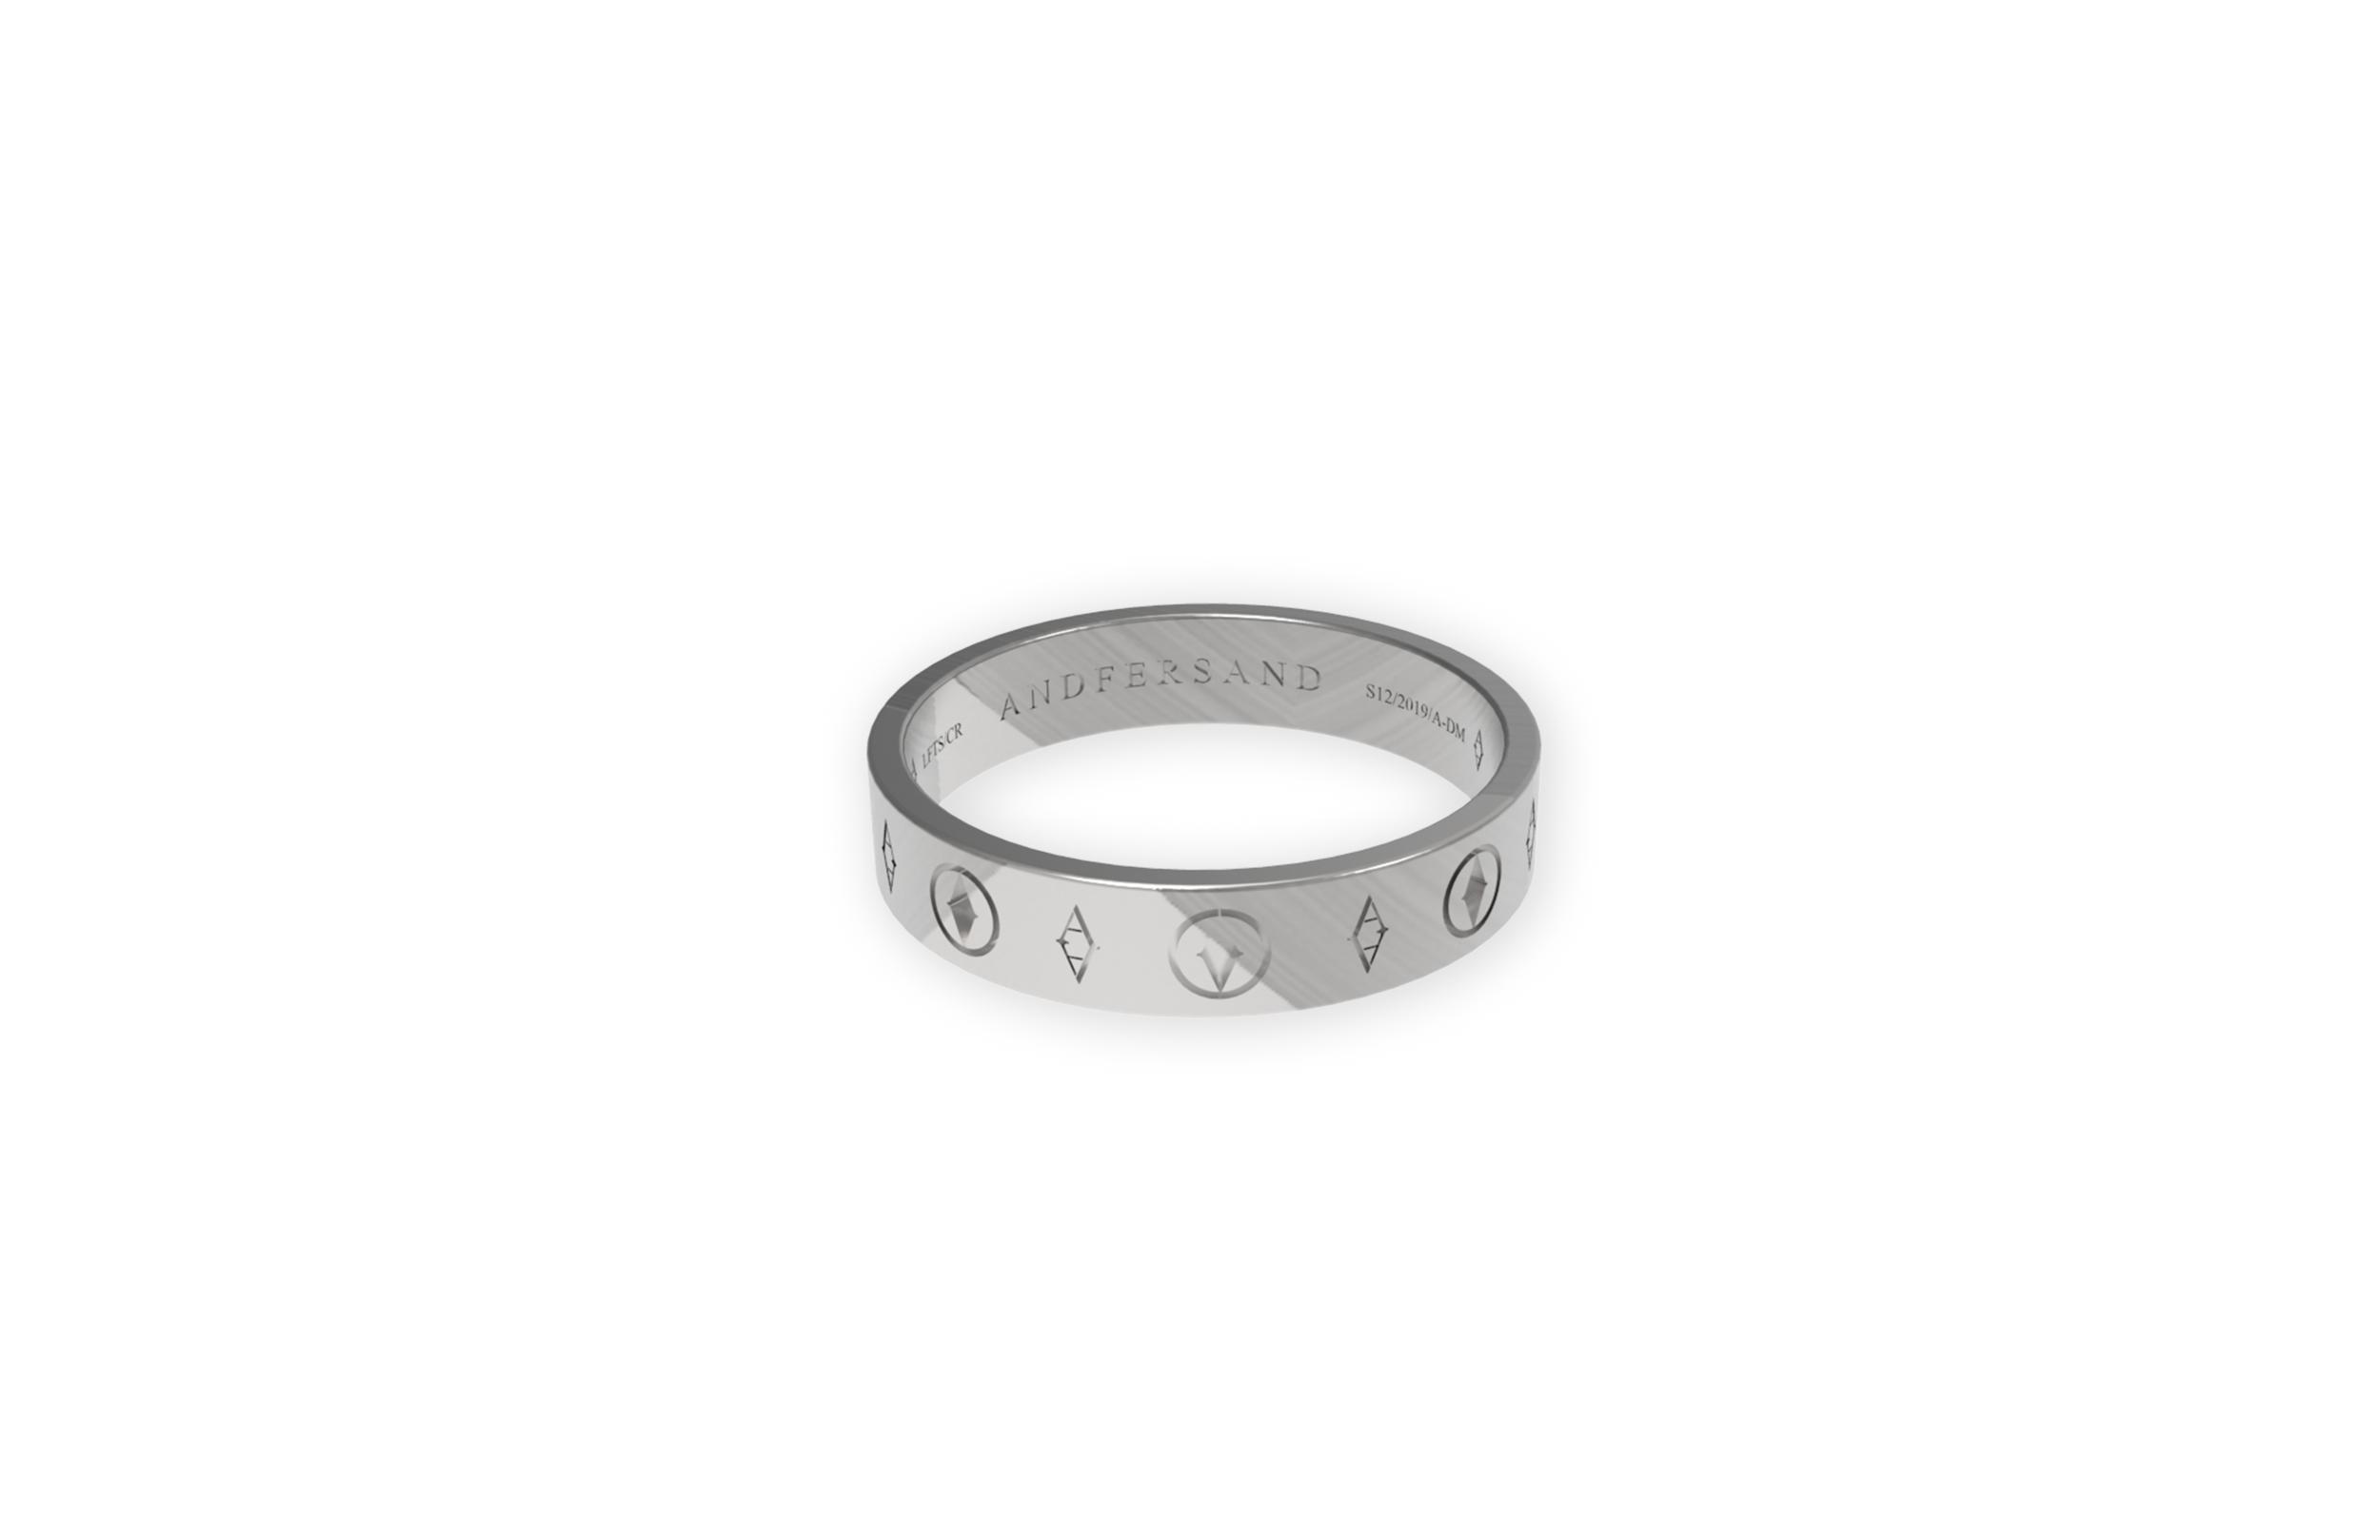 Andfersand Ring | 戒指设计